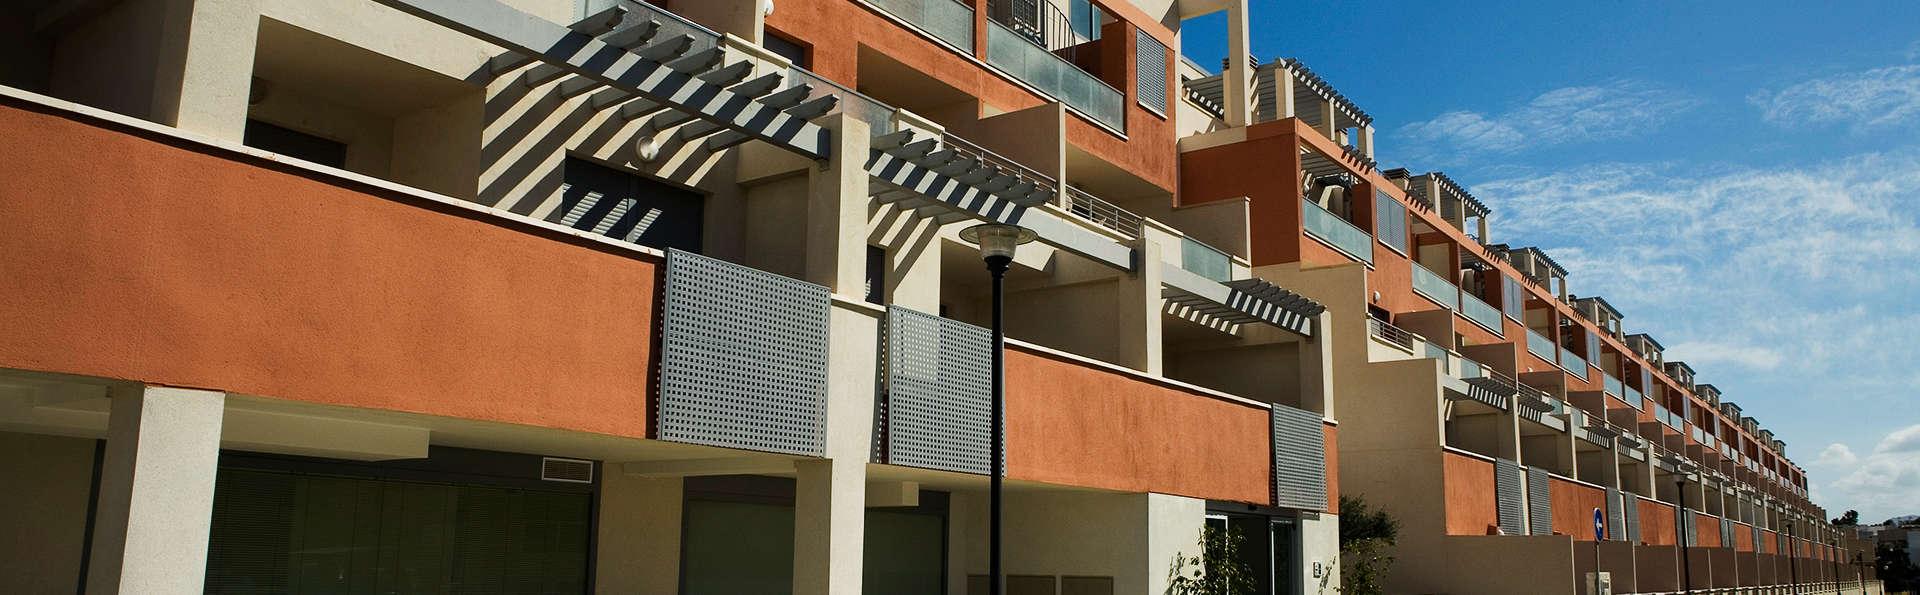 Apartamentos marina rey 3 vera playa espagne - Apartamentos marina rey vera booking ...